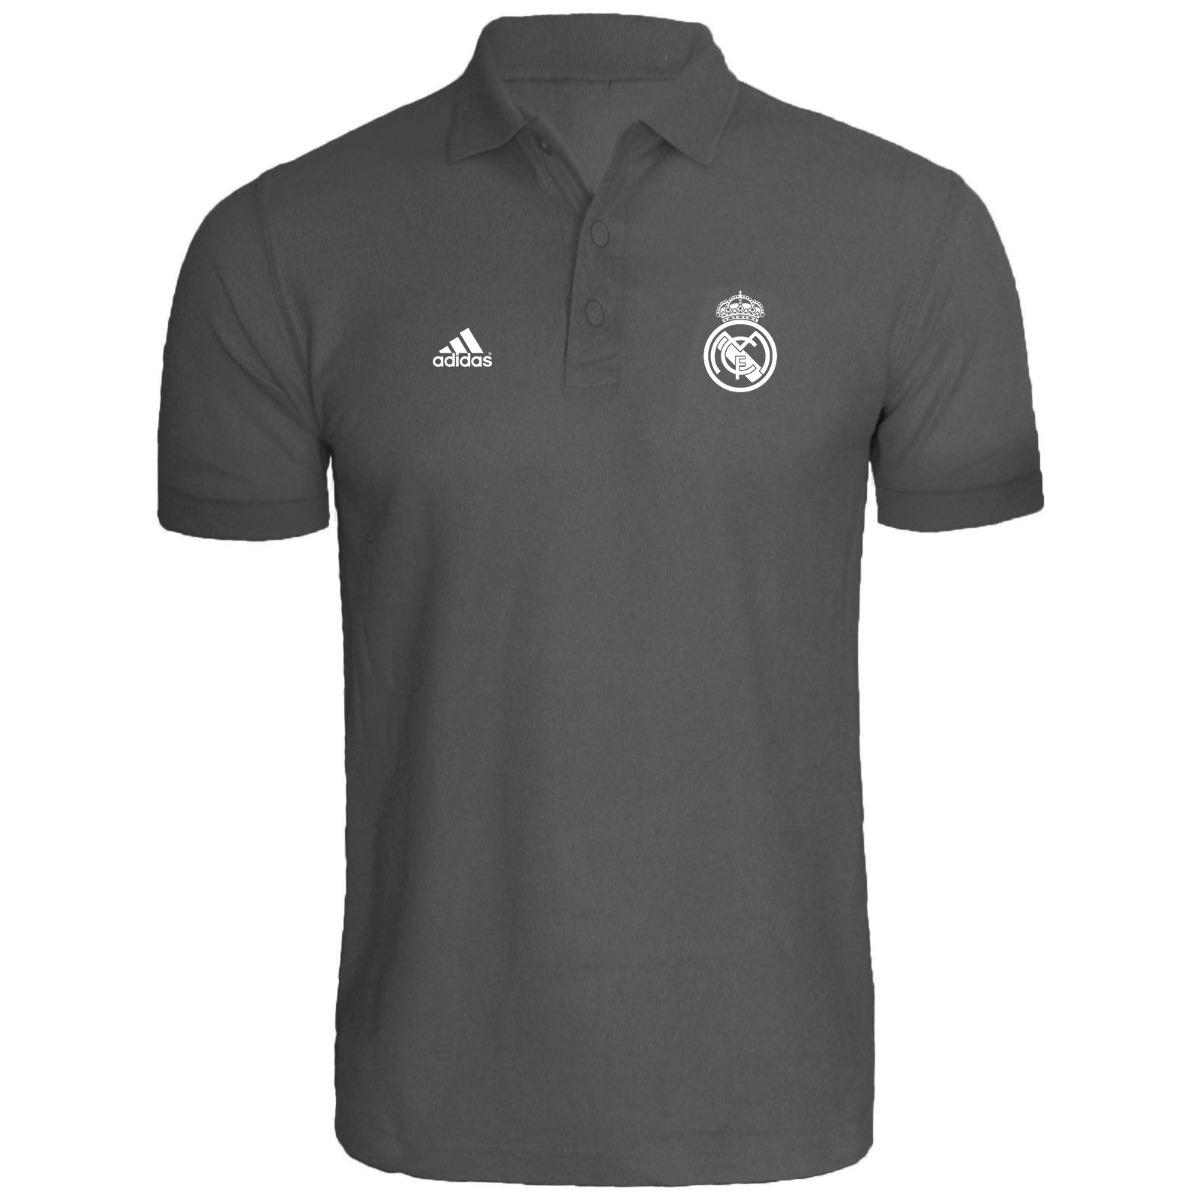 507ccc0844ff3 Camisa Camiseta Polo Real Madrid Personalizado - R  39